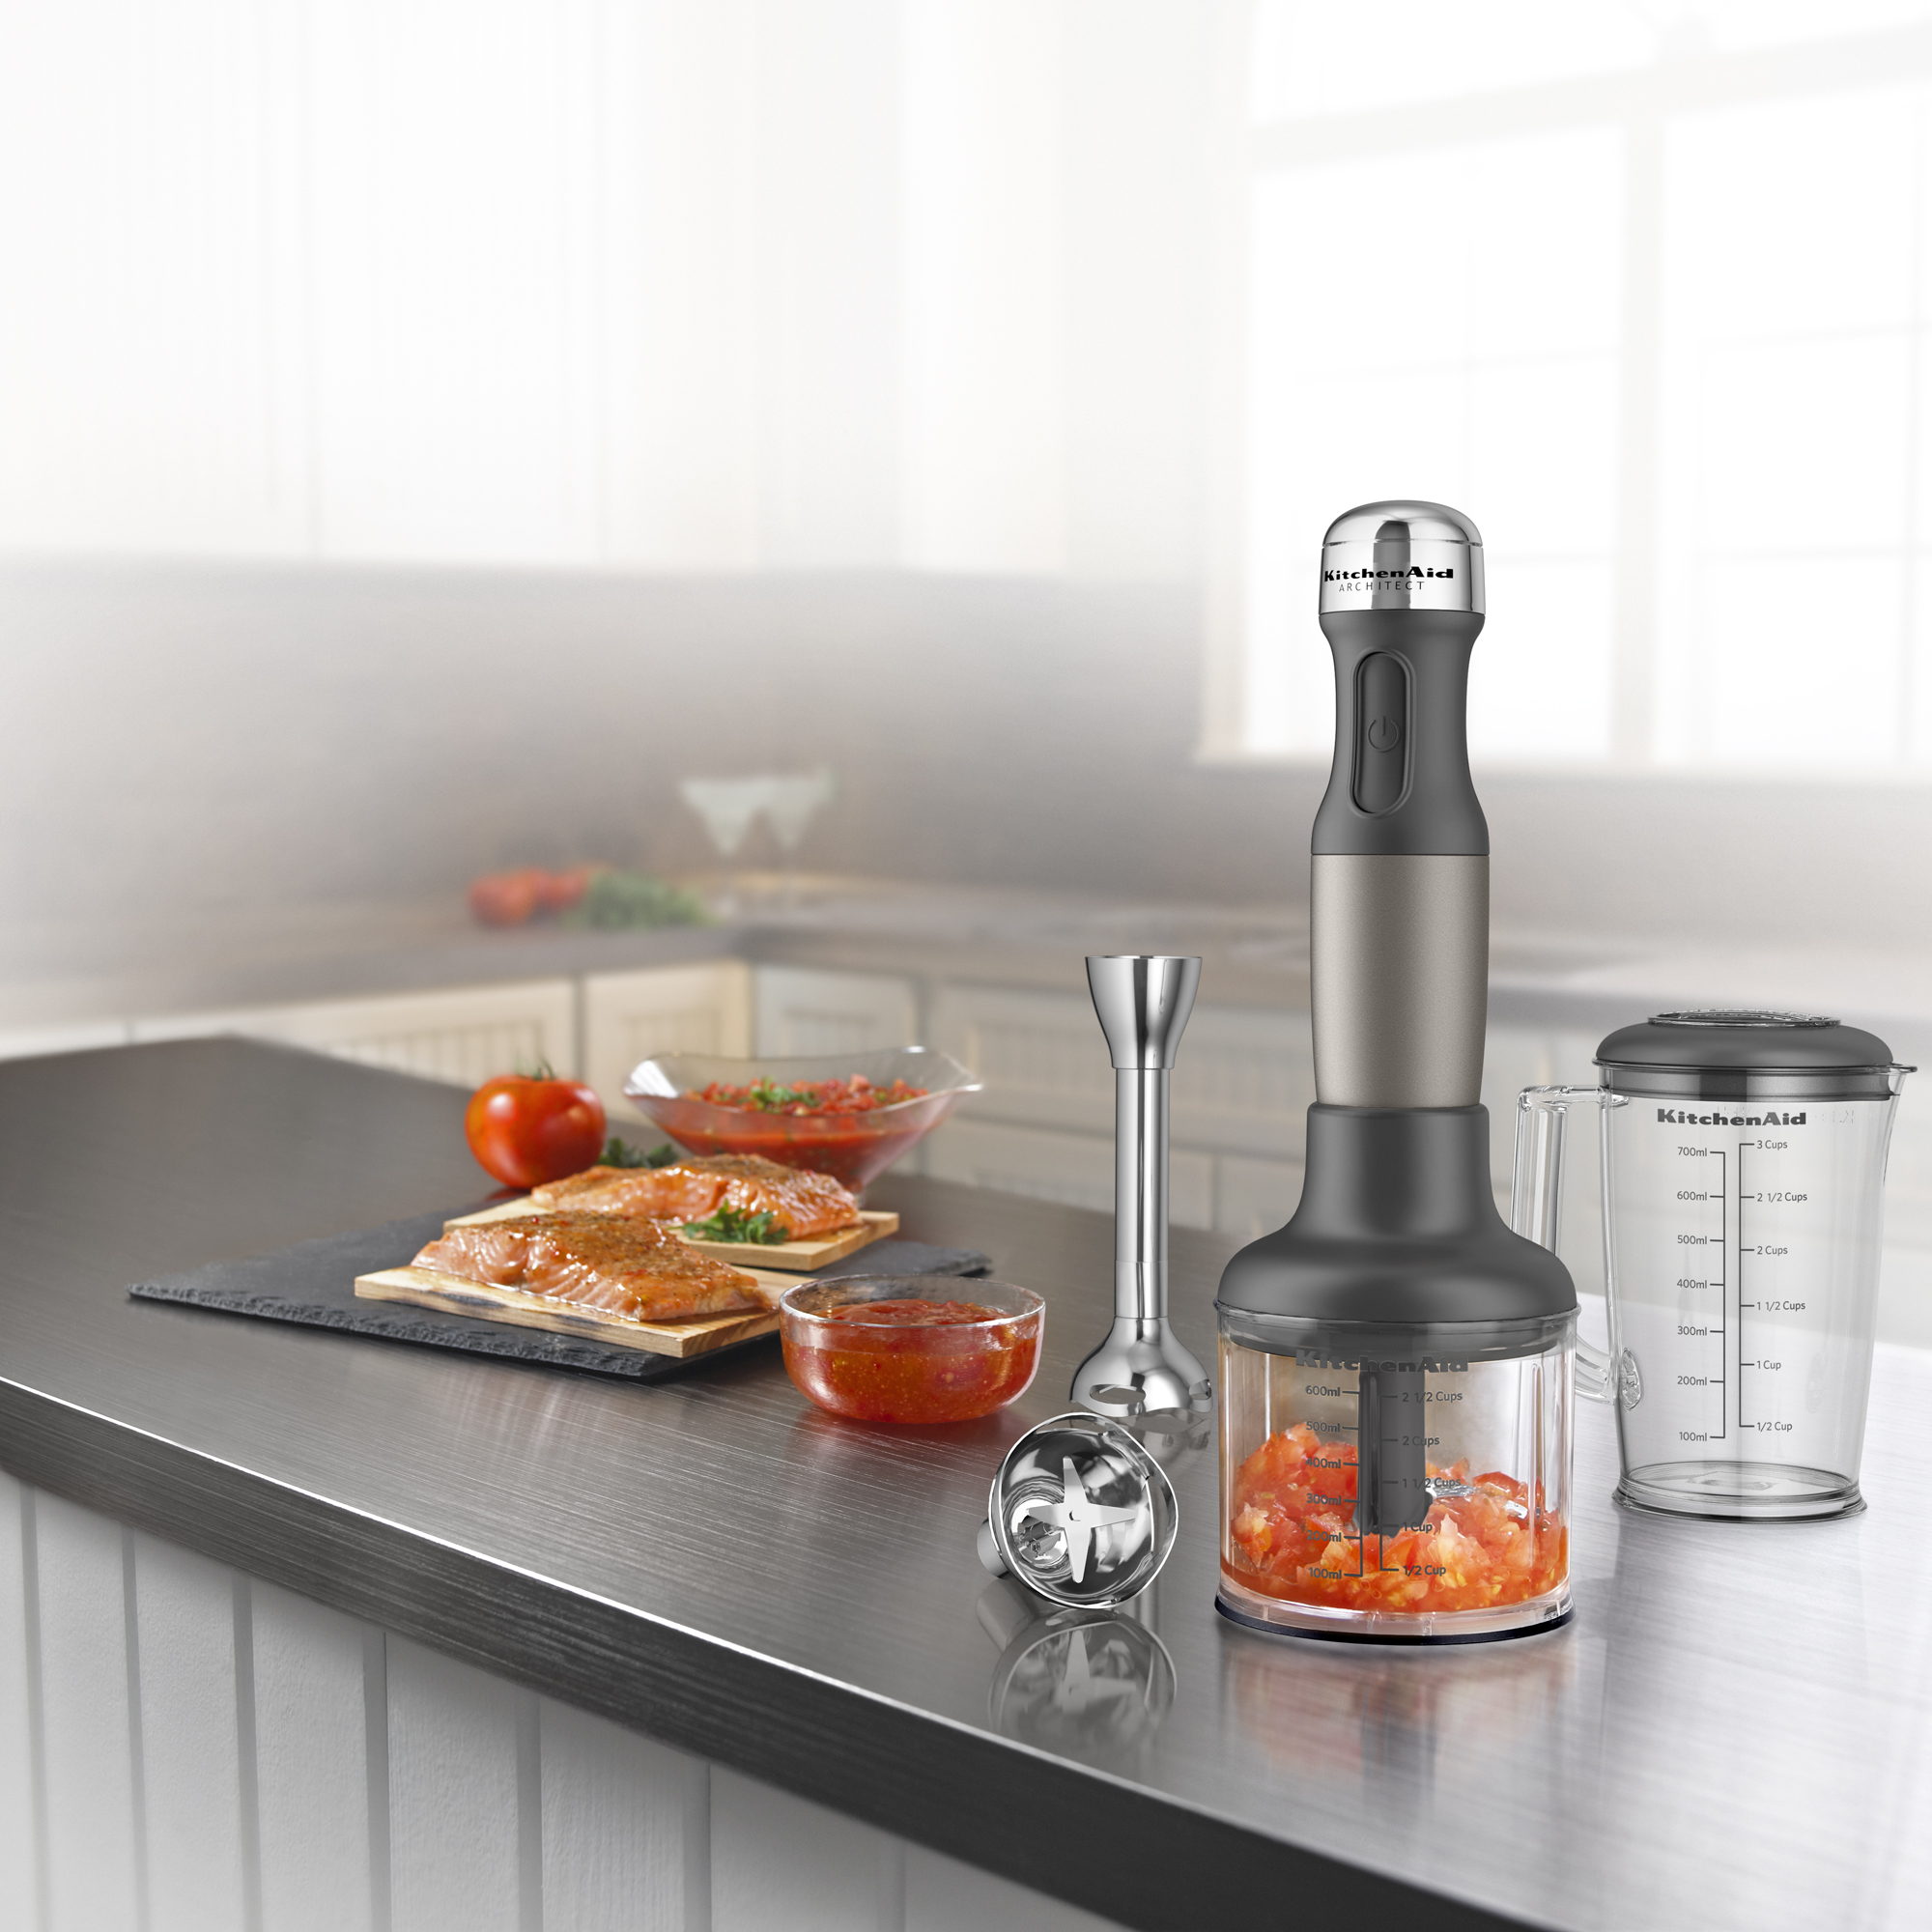 KitchenAid-Refurbished-3-Speed-Hand-Blender-RKHB2351 thumbnail 4